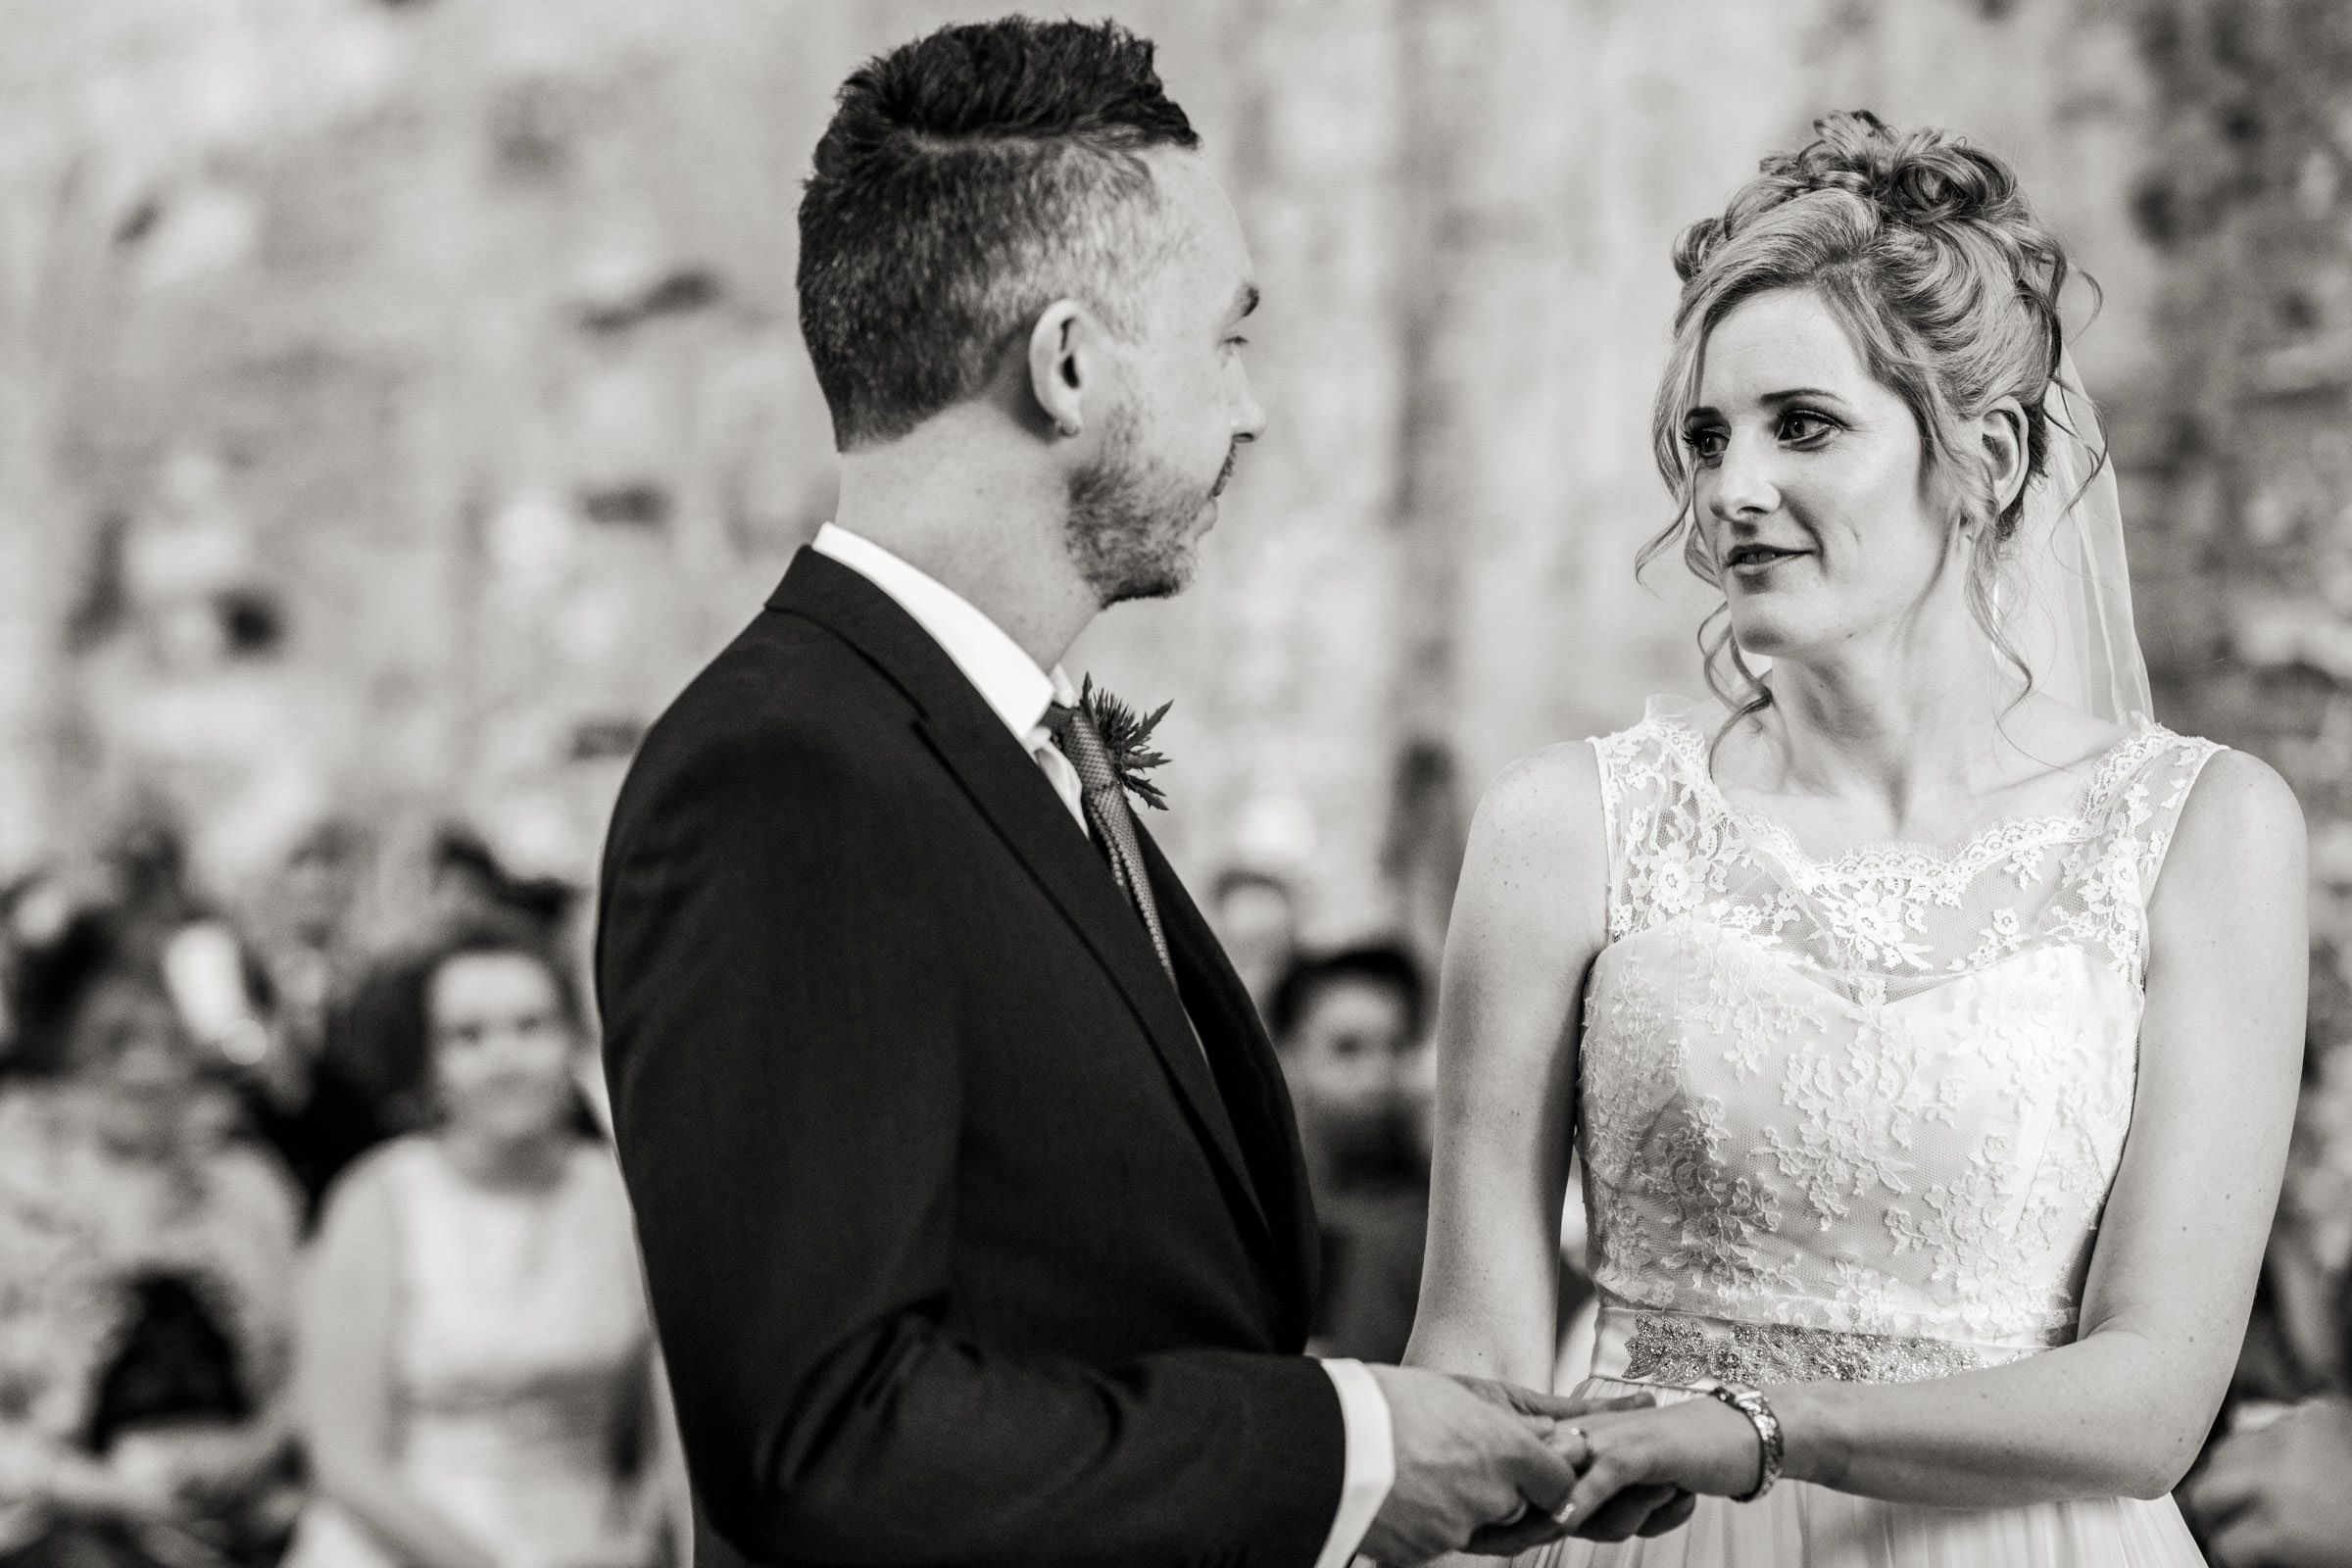 Lulworth Castle Wedding Photography 021.jpg